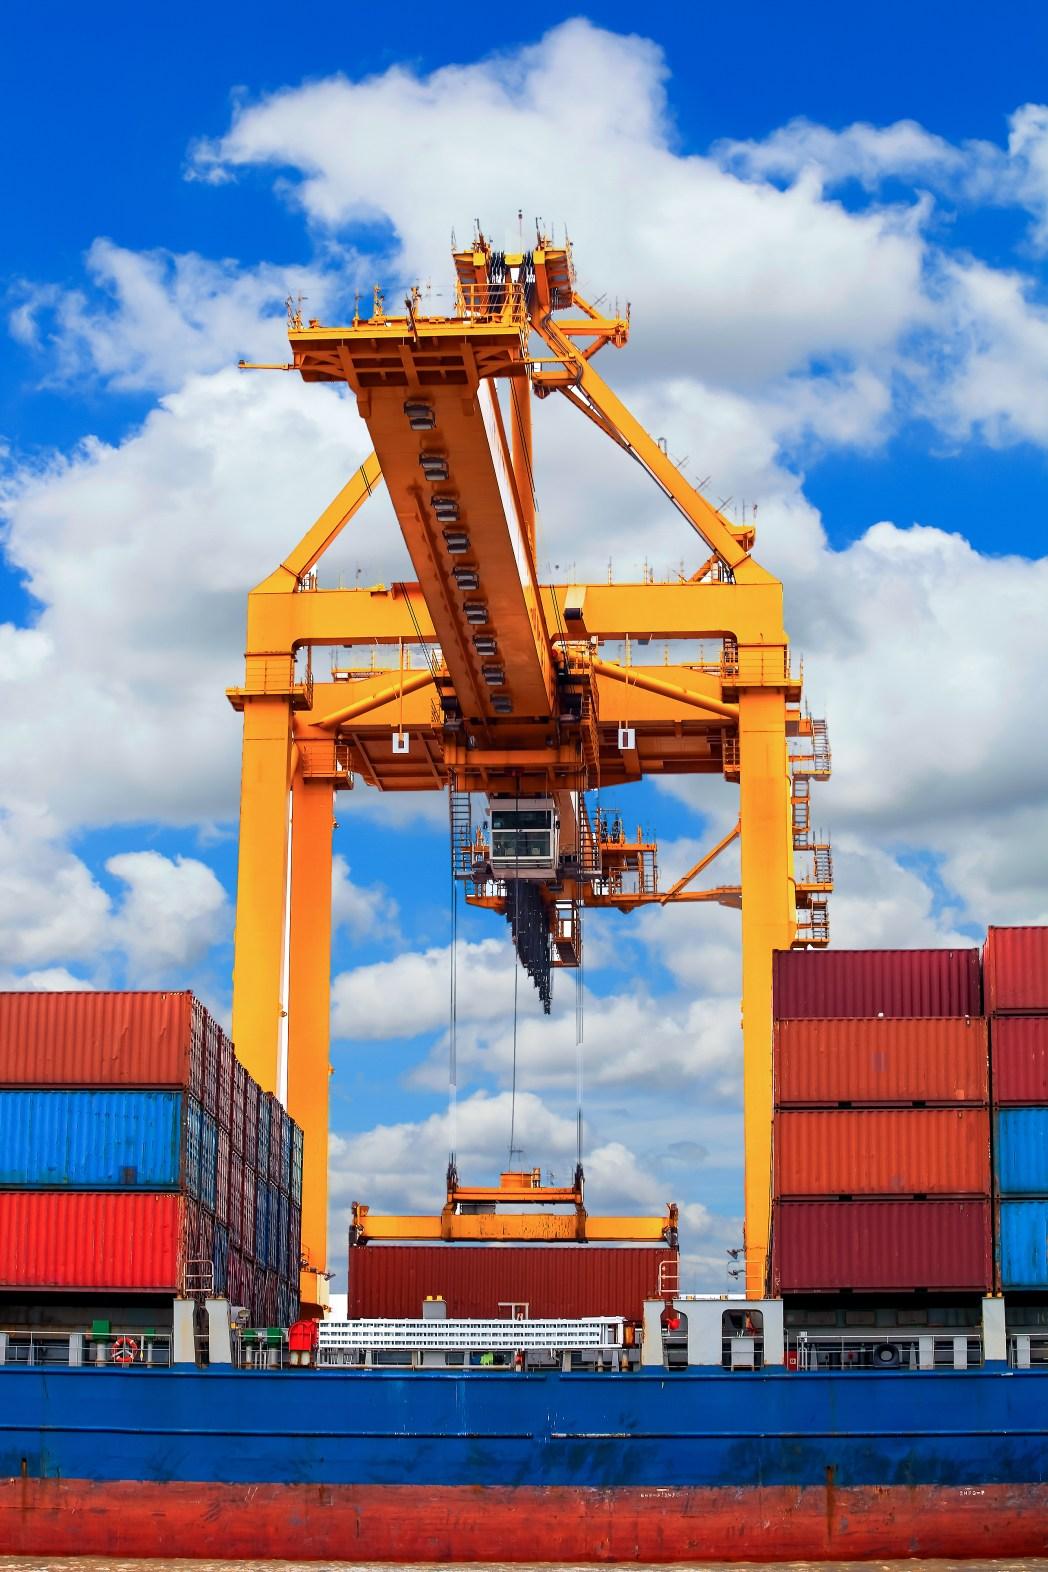 Containers στο λιμάνι του Ρότερνταμ